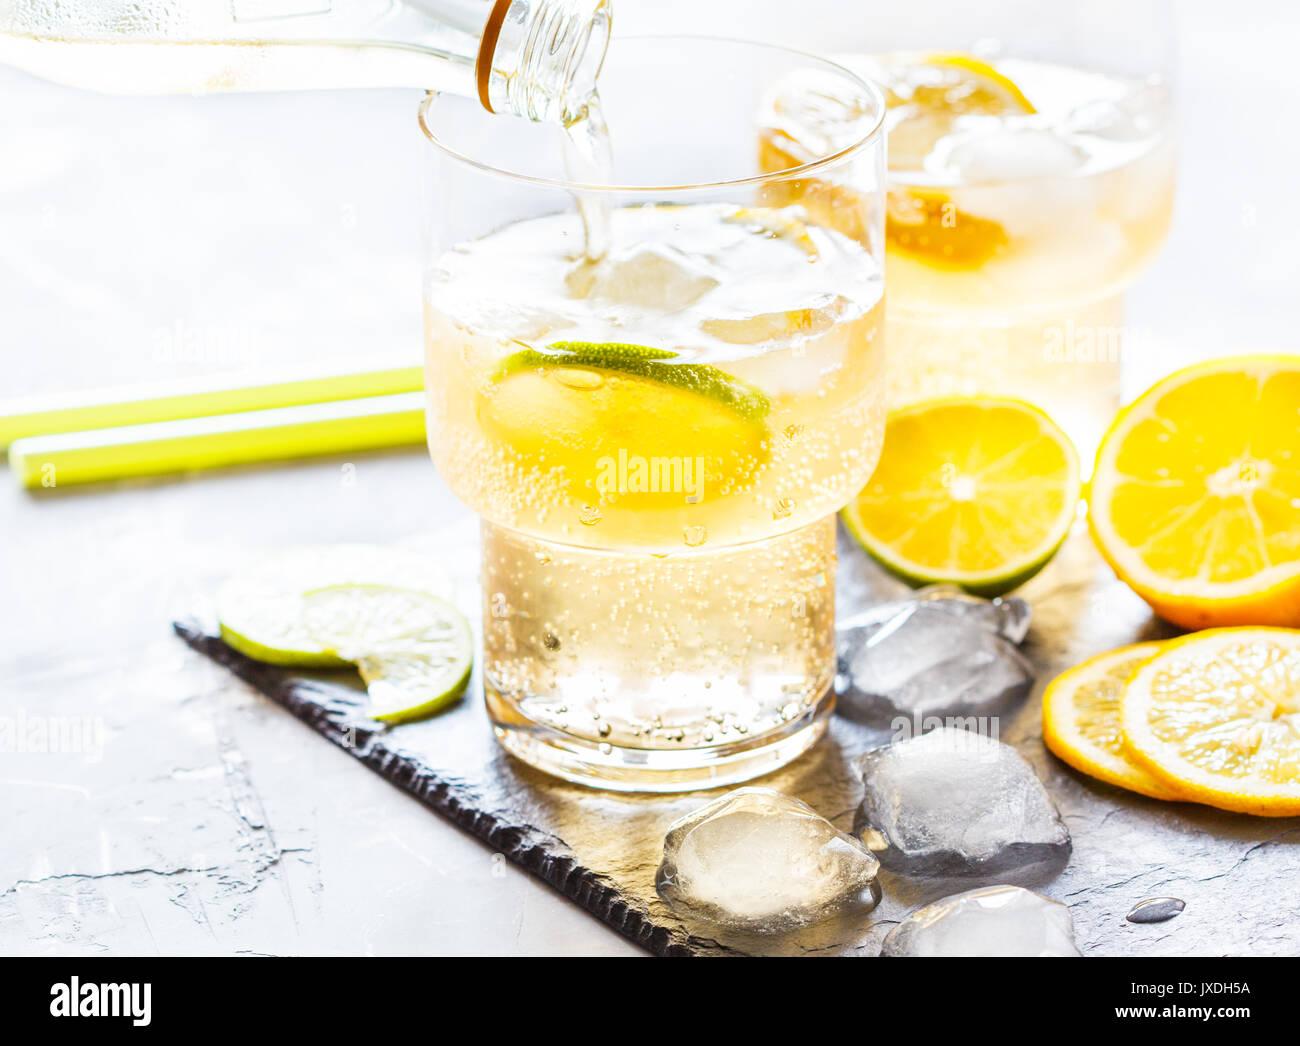 Homemade citrus lemonade in glasses with ice on slate. - Stock Image